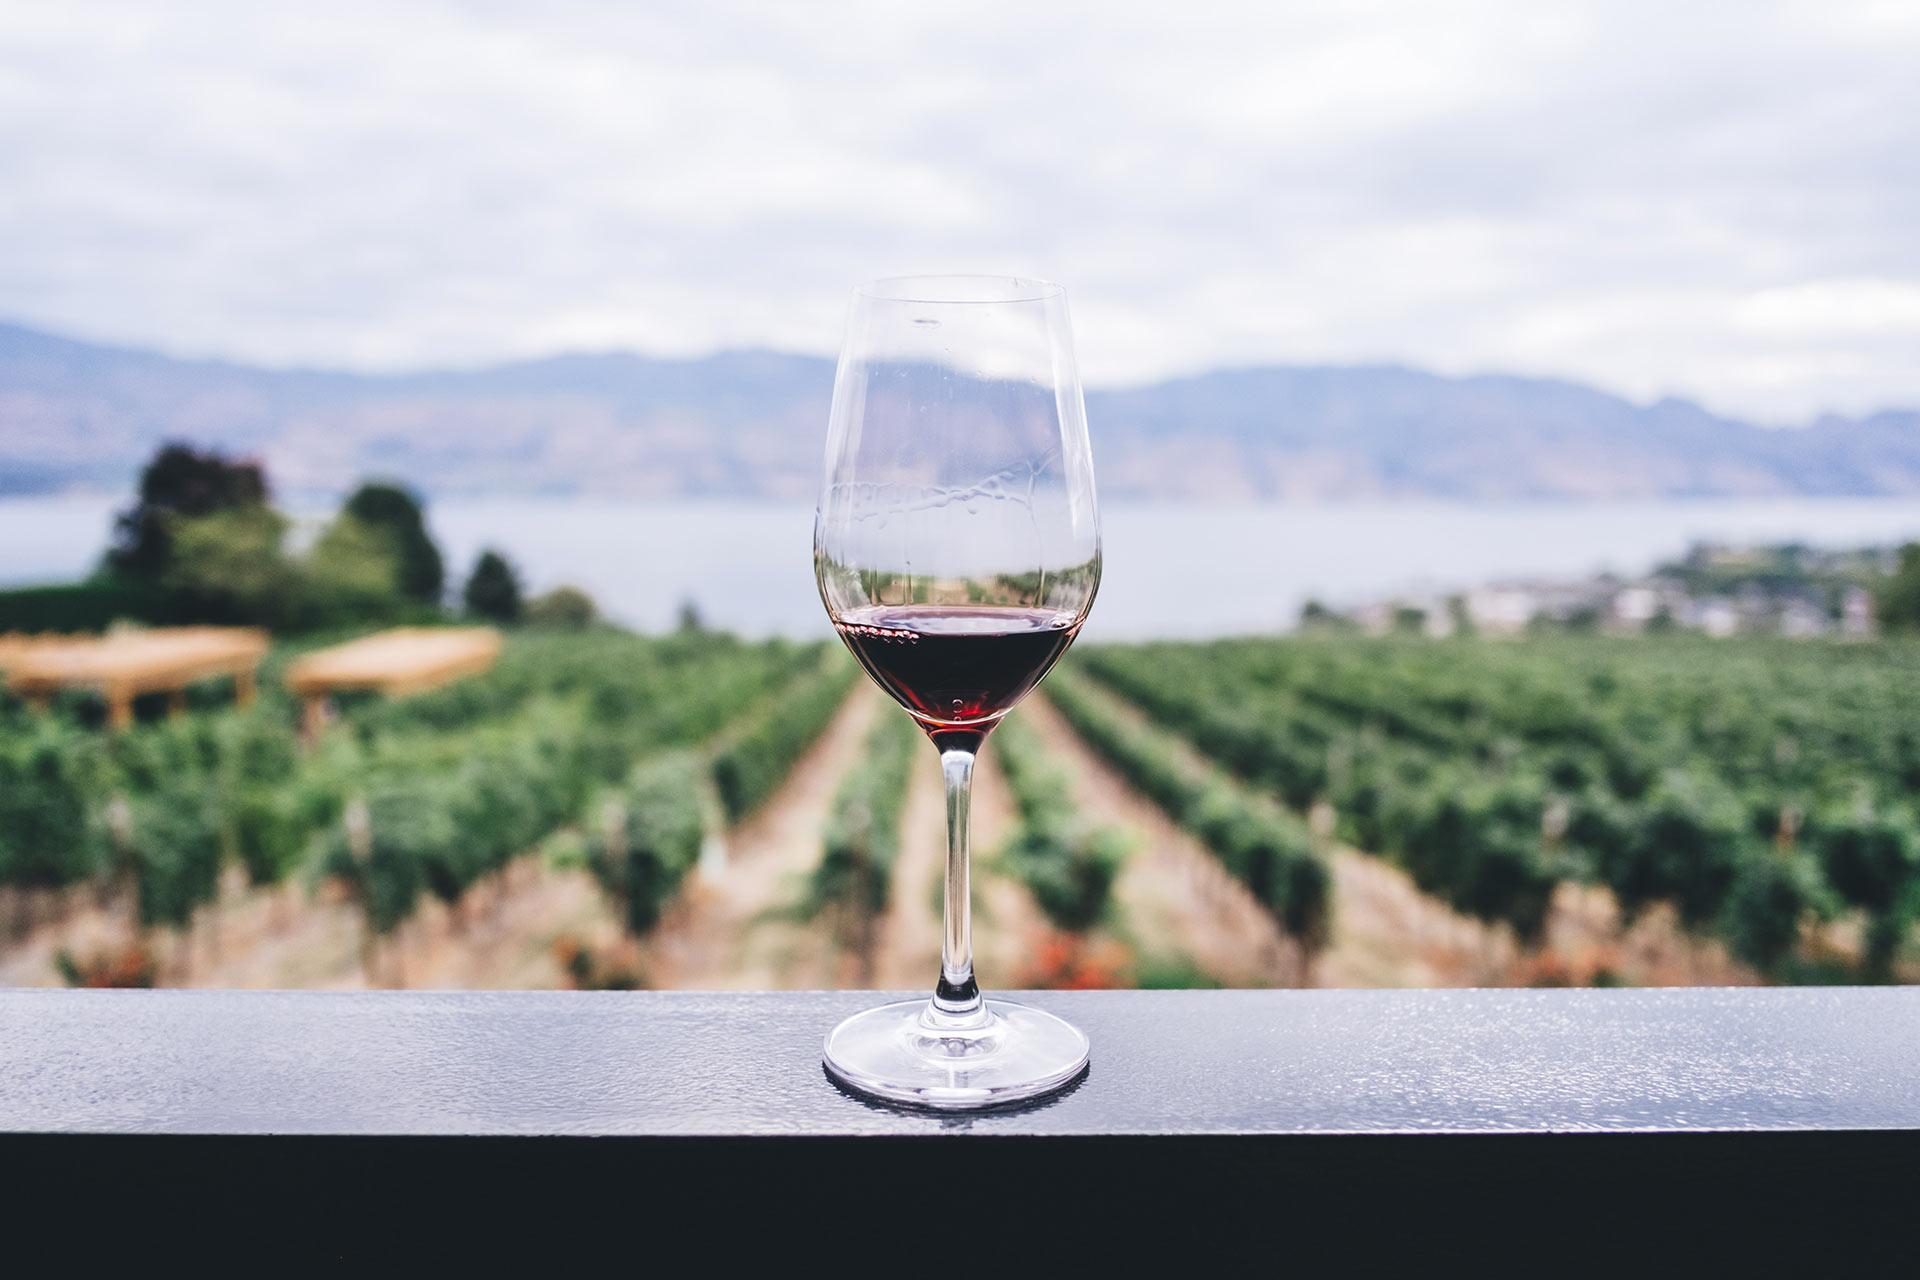 degustazione-vini-valpolicella_residence-ca-del-lago.jpg